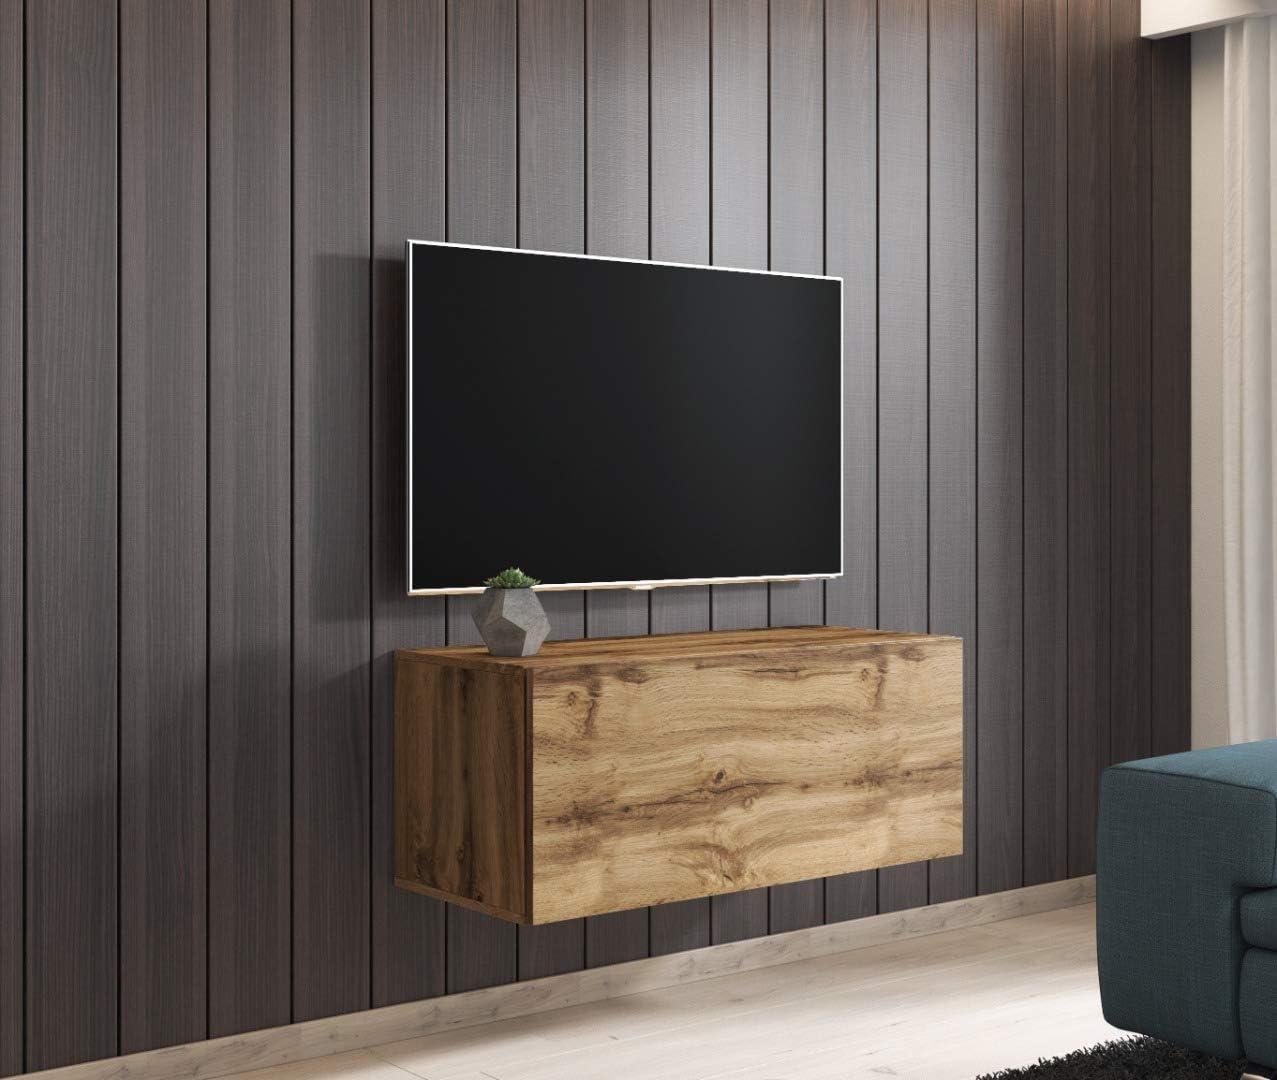 E-com - Mueble TV Salon Moderno Mesa Television Fay - 100 cm ...